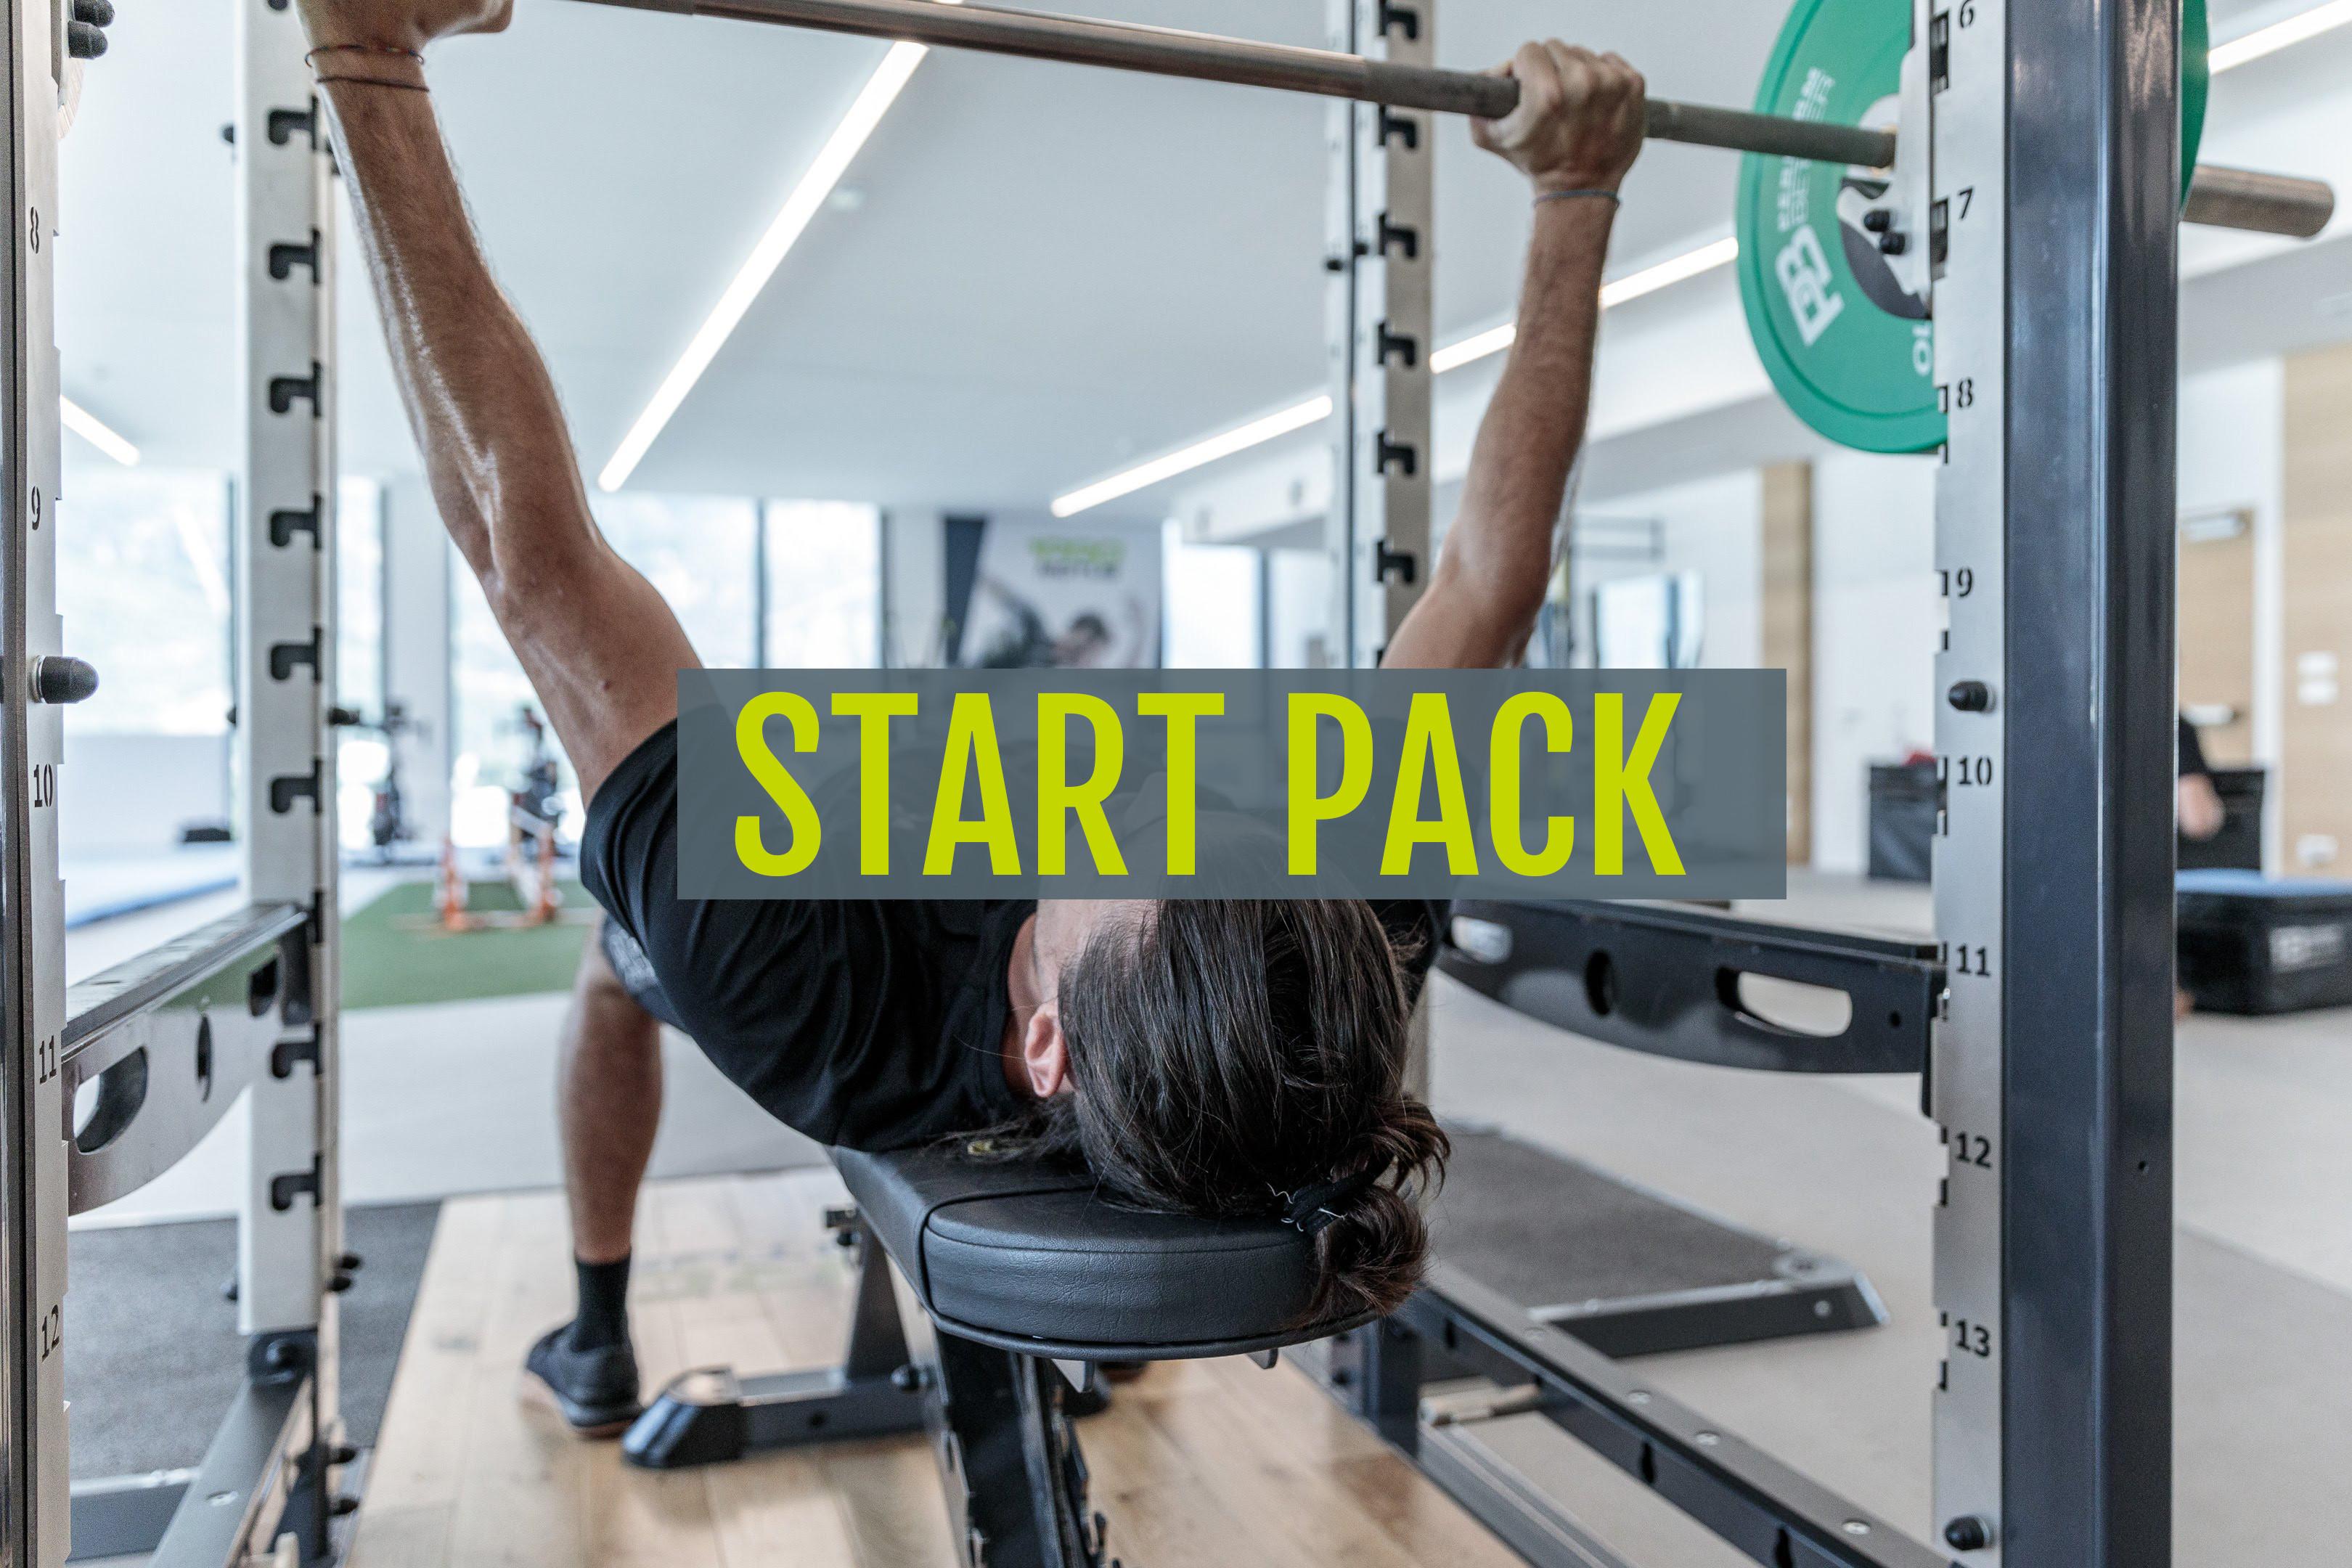 Tennis - Start Pack